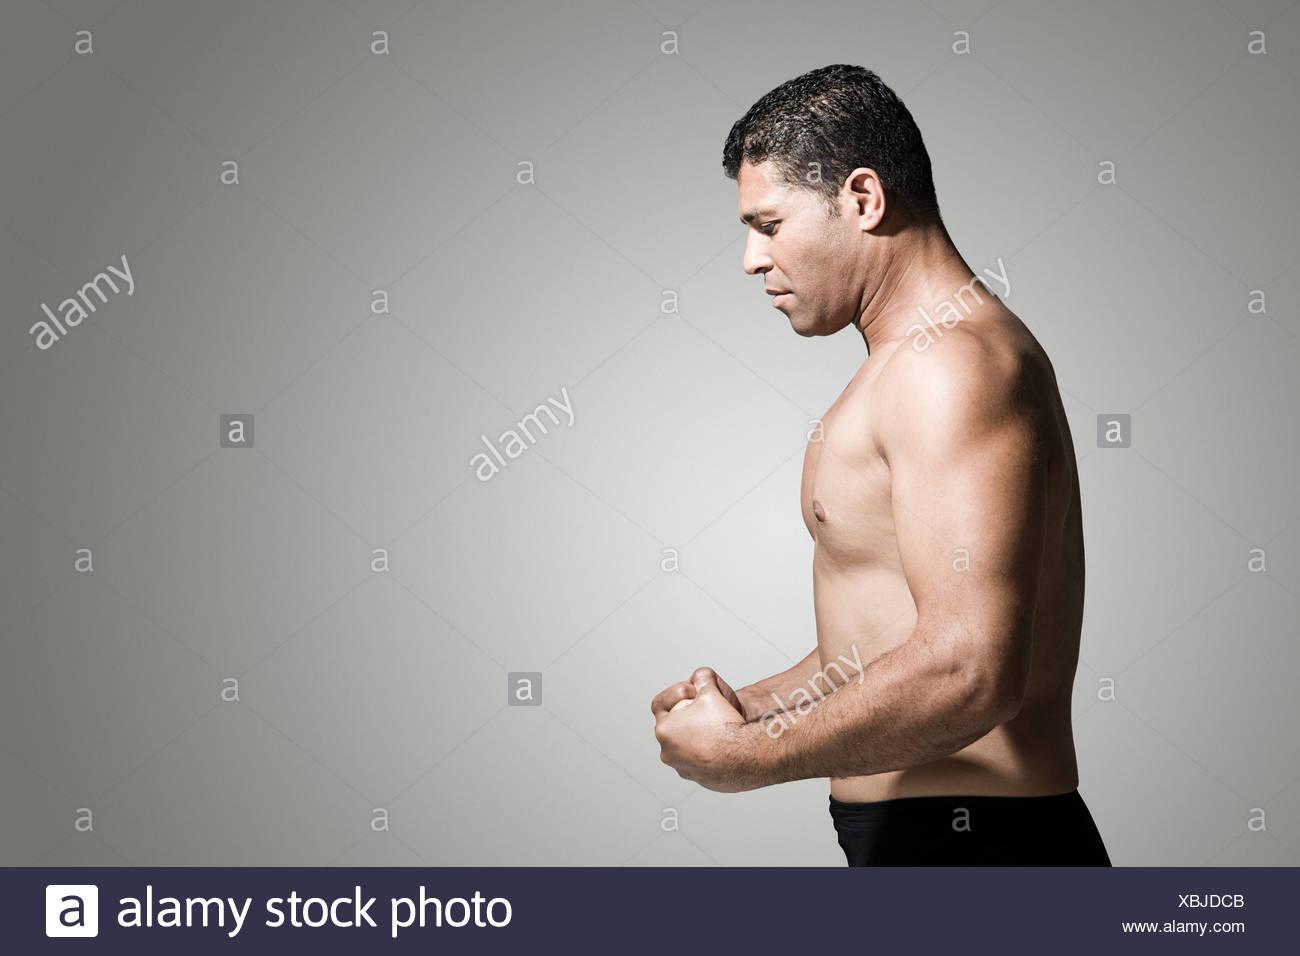 Muscular Stockfotos & Muscular Bilder - Alamy